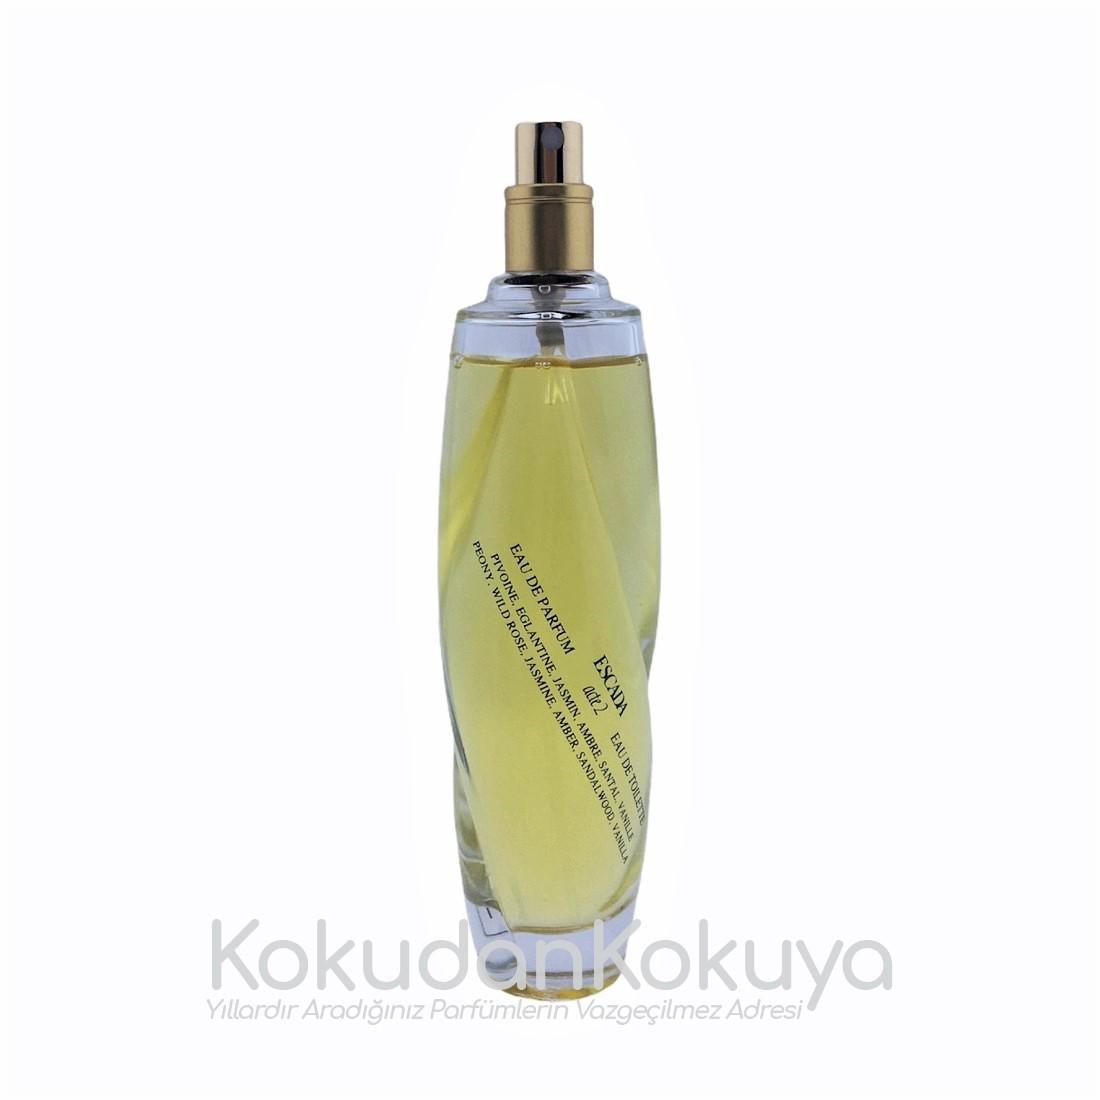 ESCADA Acte 2 (Vintage) Parfüm Kadın 100ml Eau De Toilette (EDT) Sprey